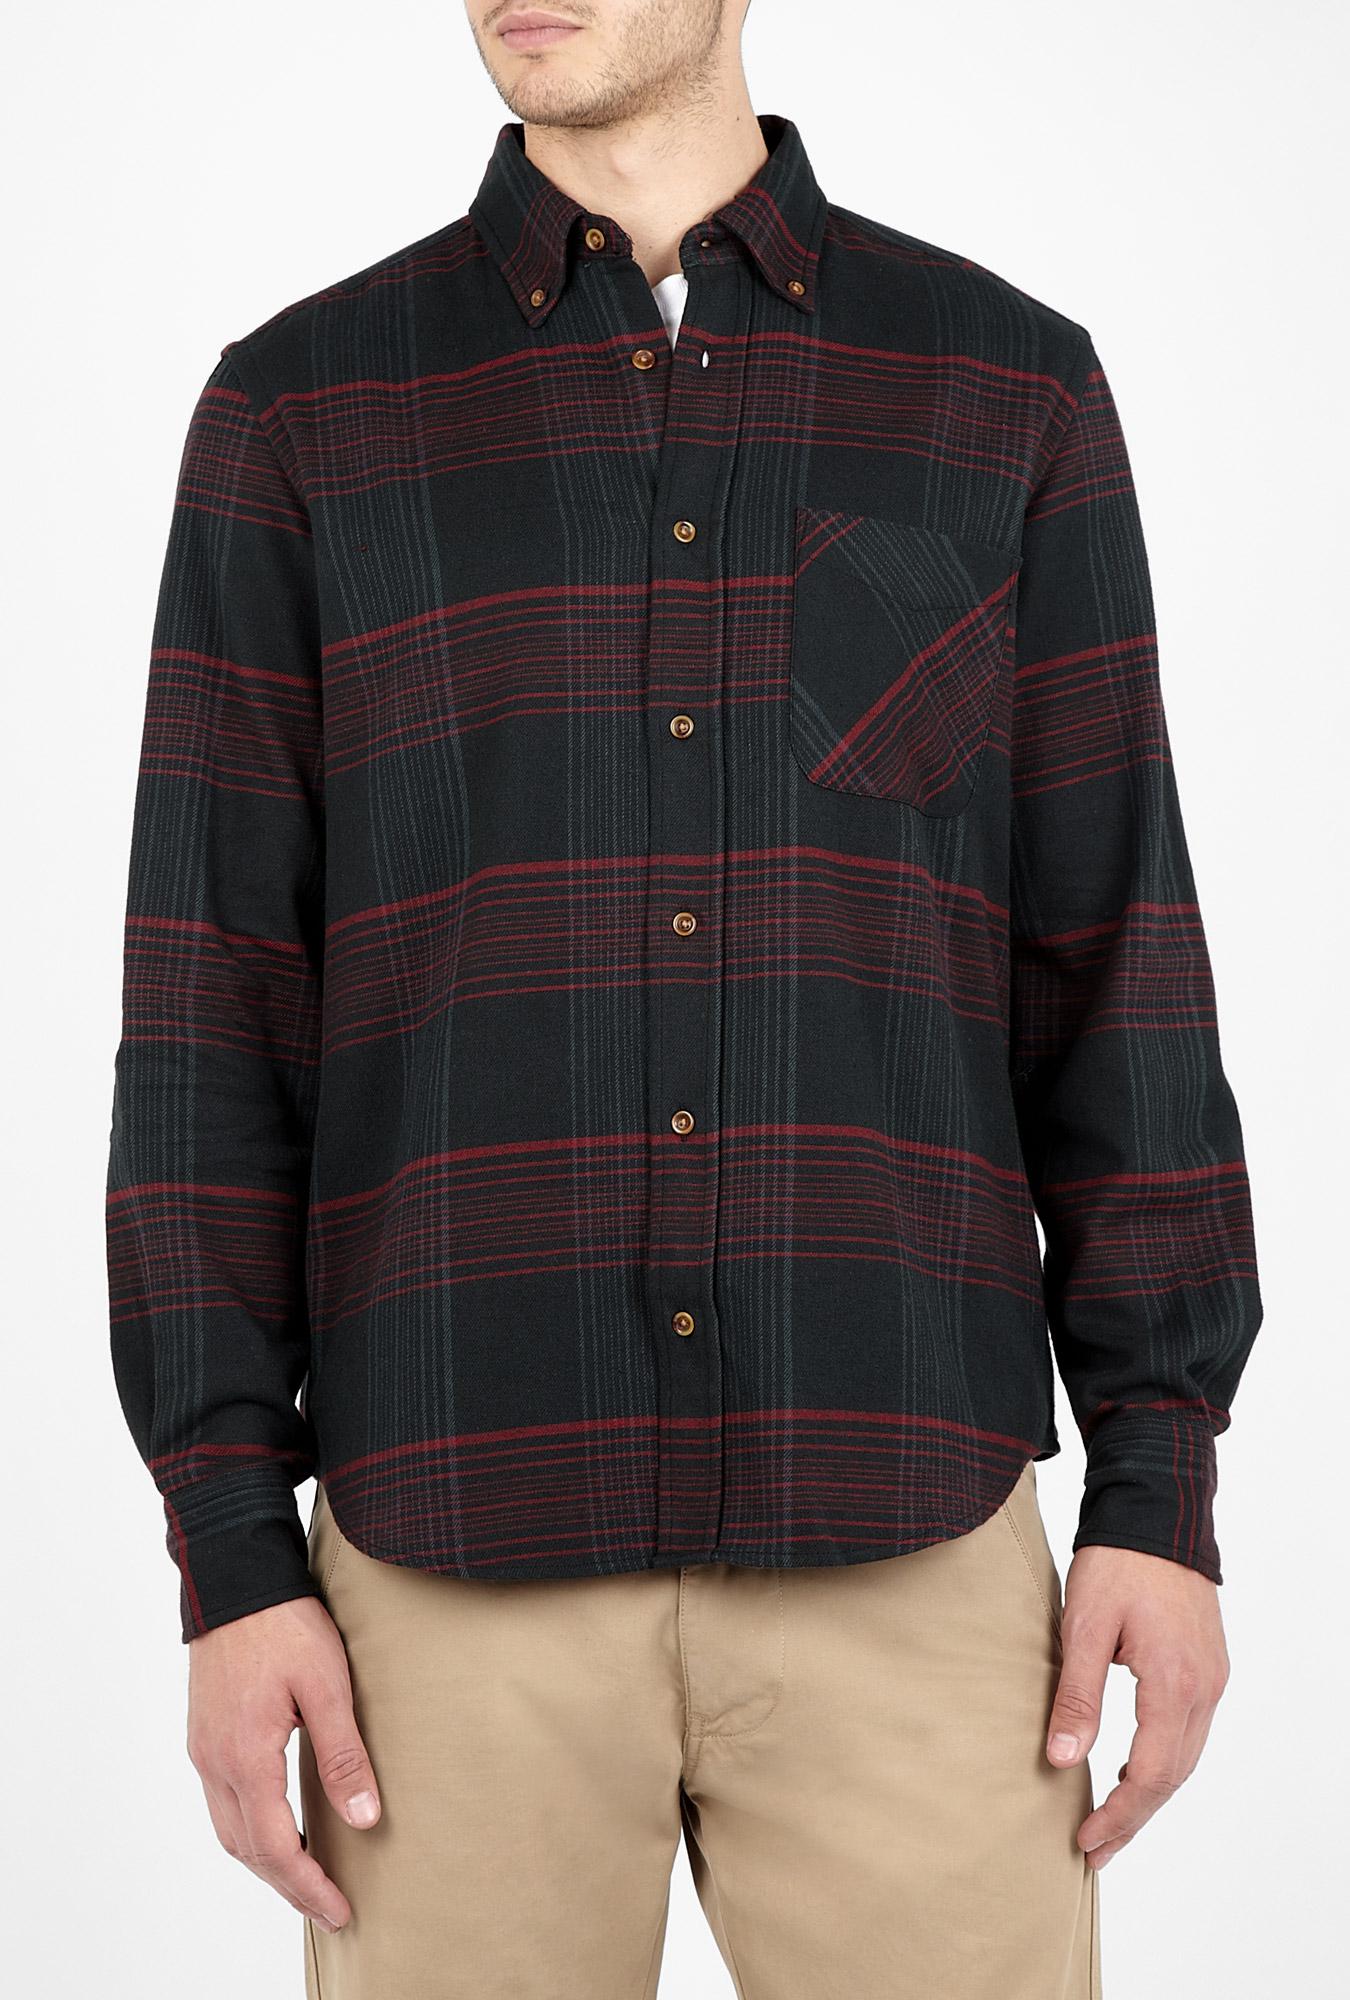 Adam kimmel x carhartt black plaid flannel button collar for Black watch plaid flannel shirt